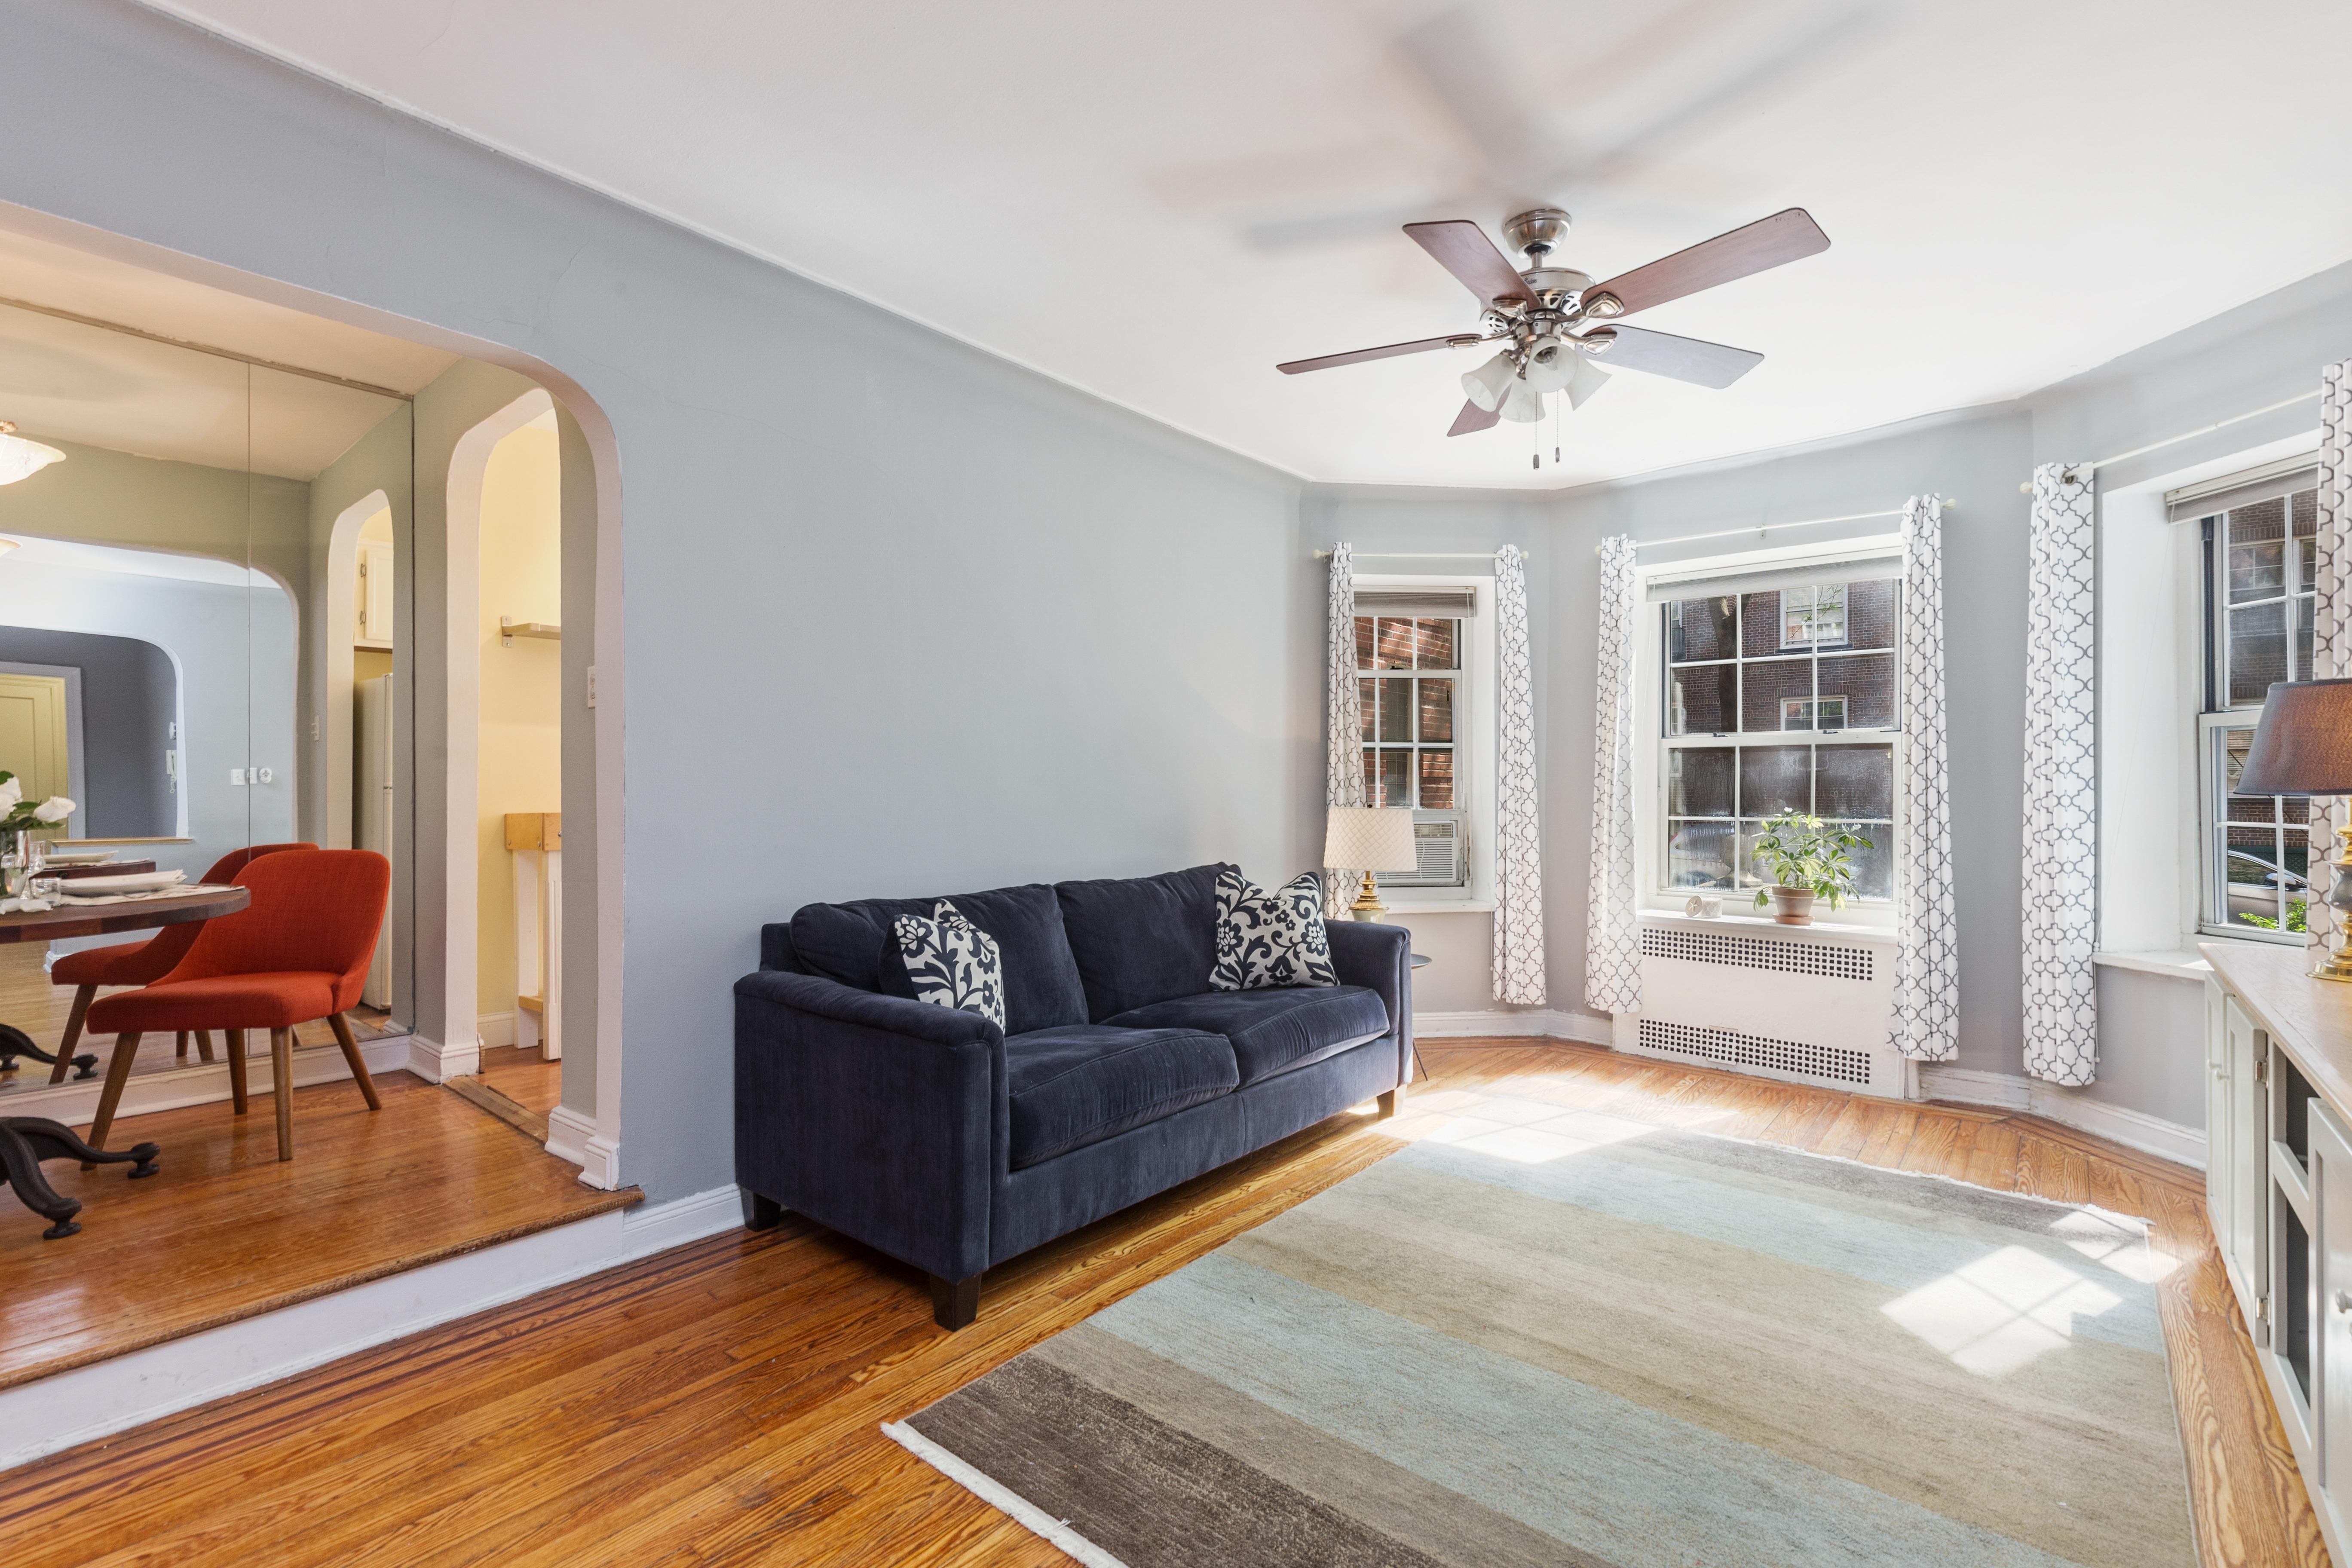 Living Room East Facing